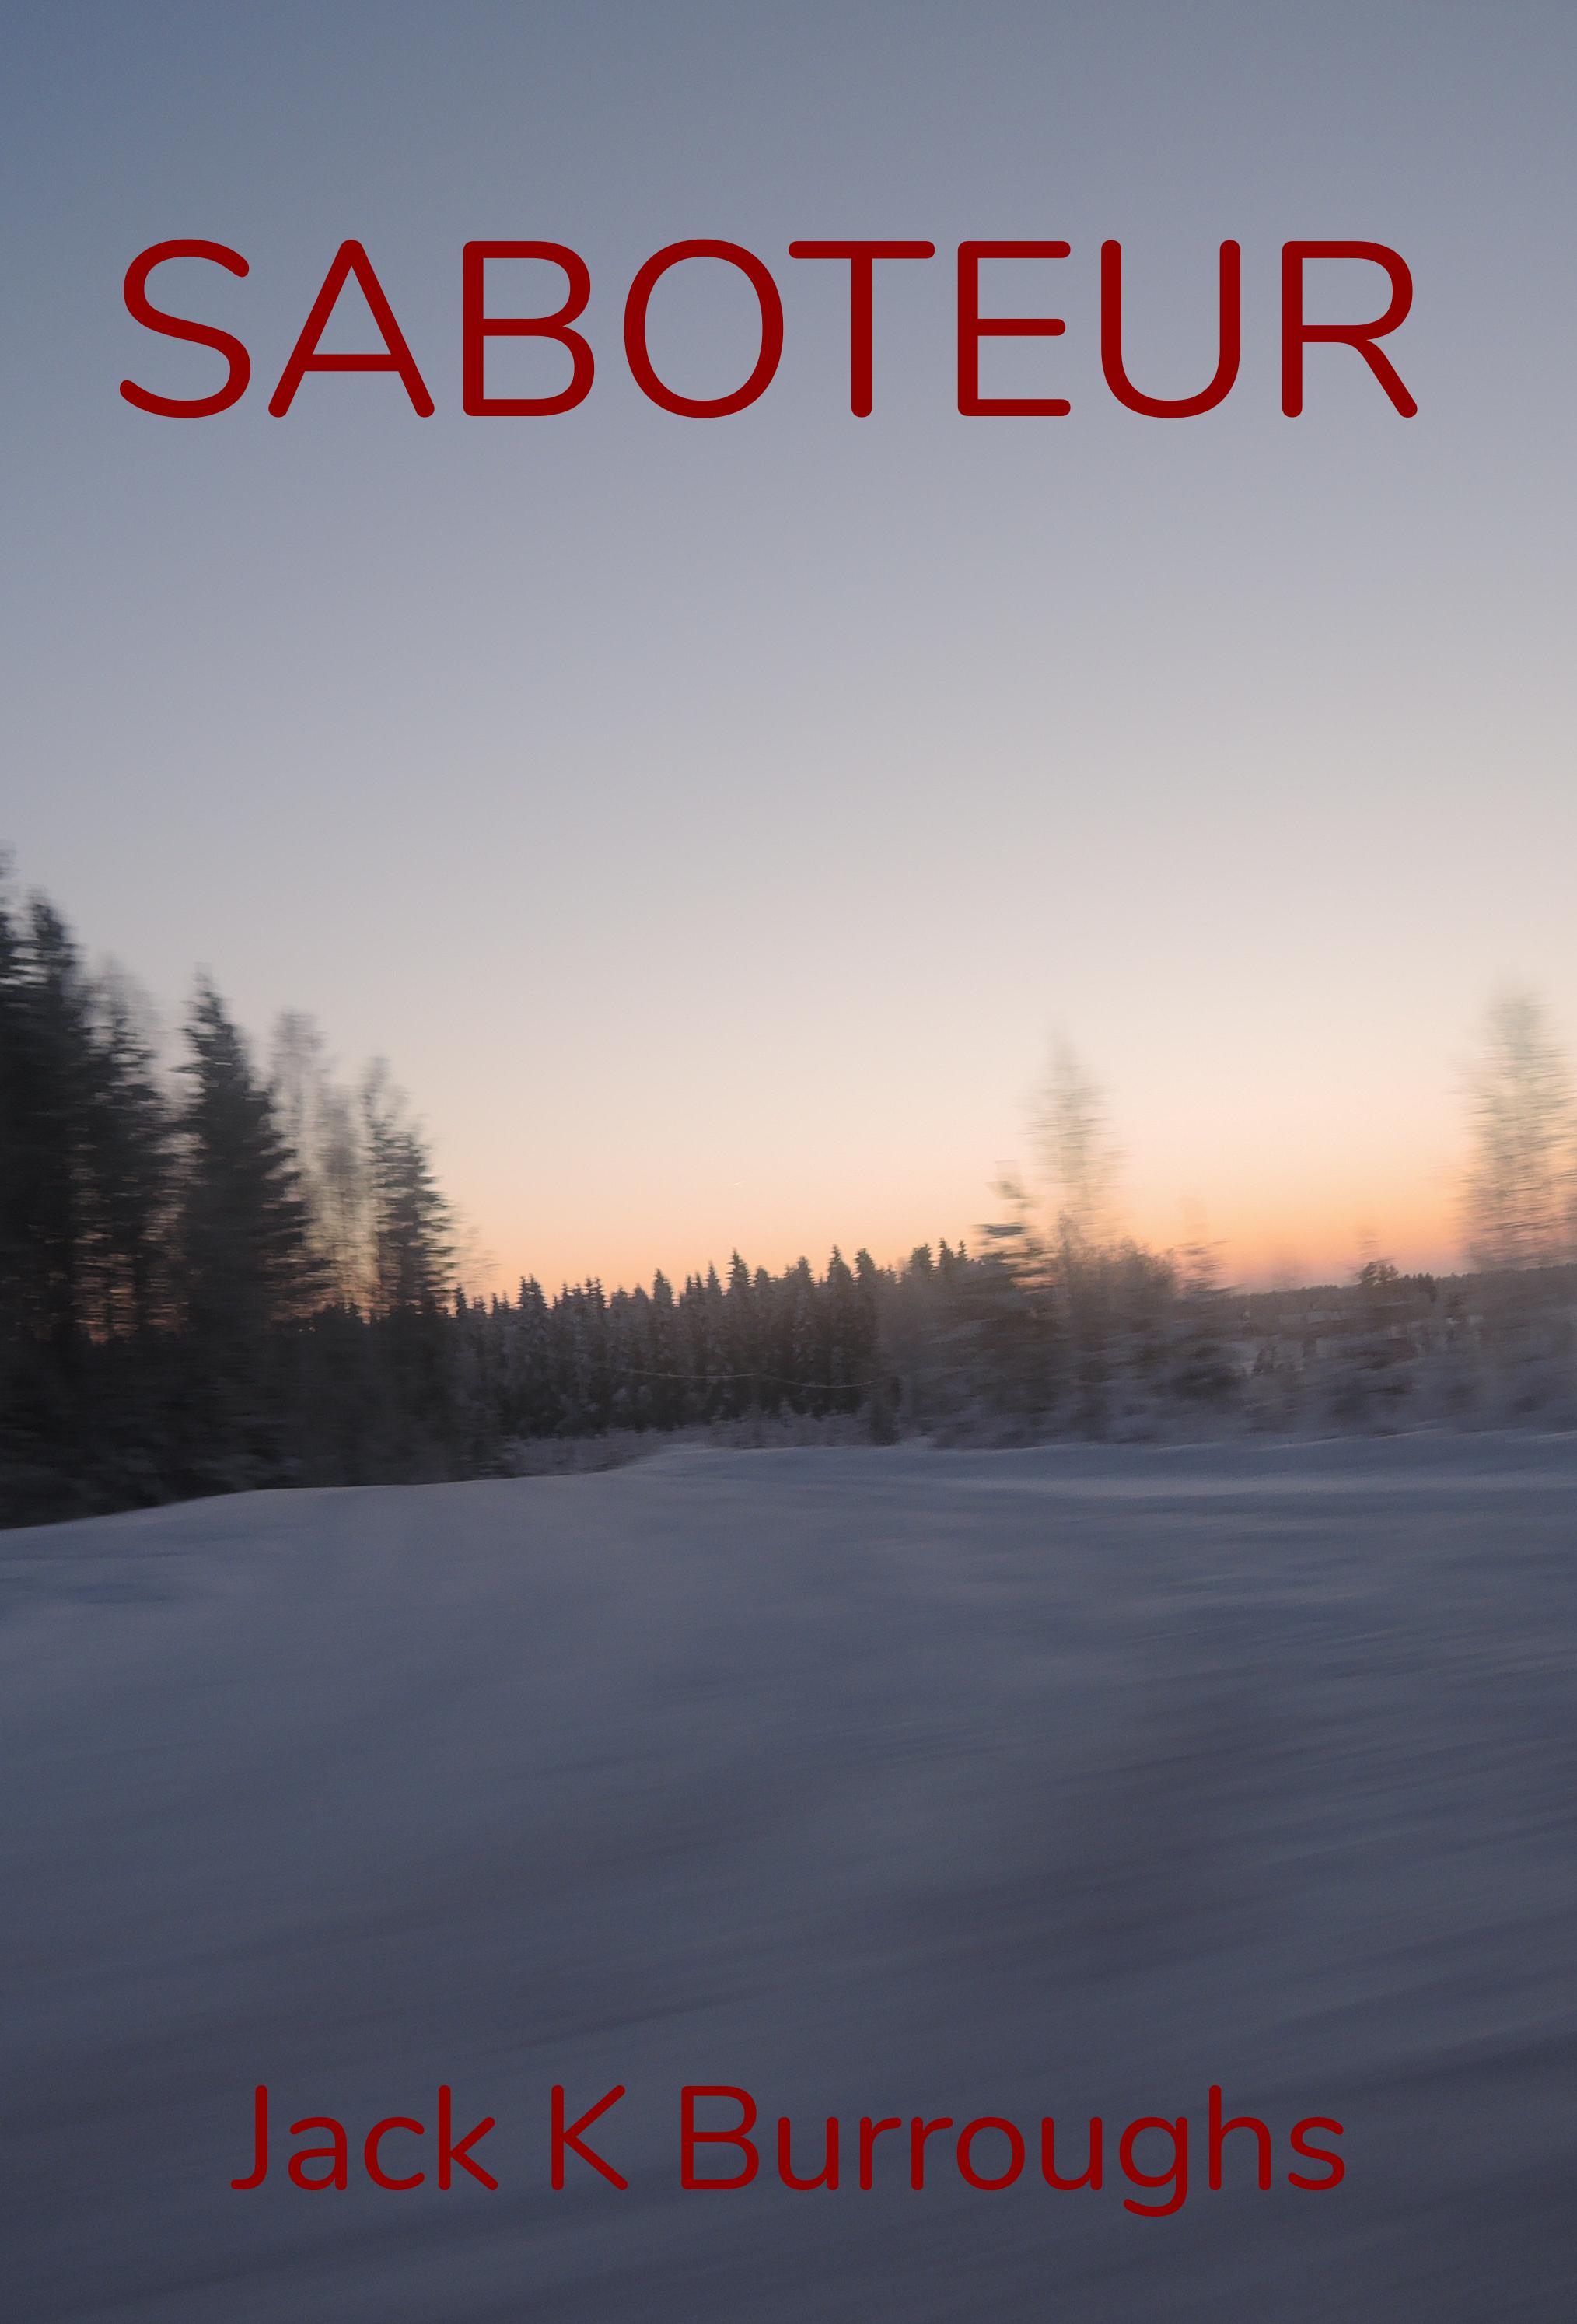 Saboteur2.jpg